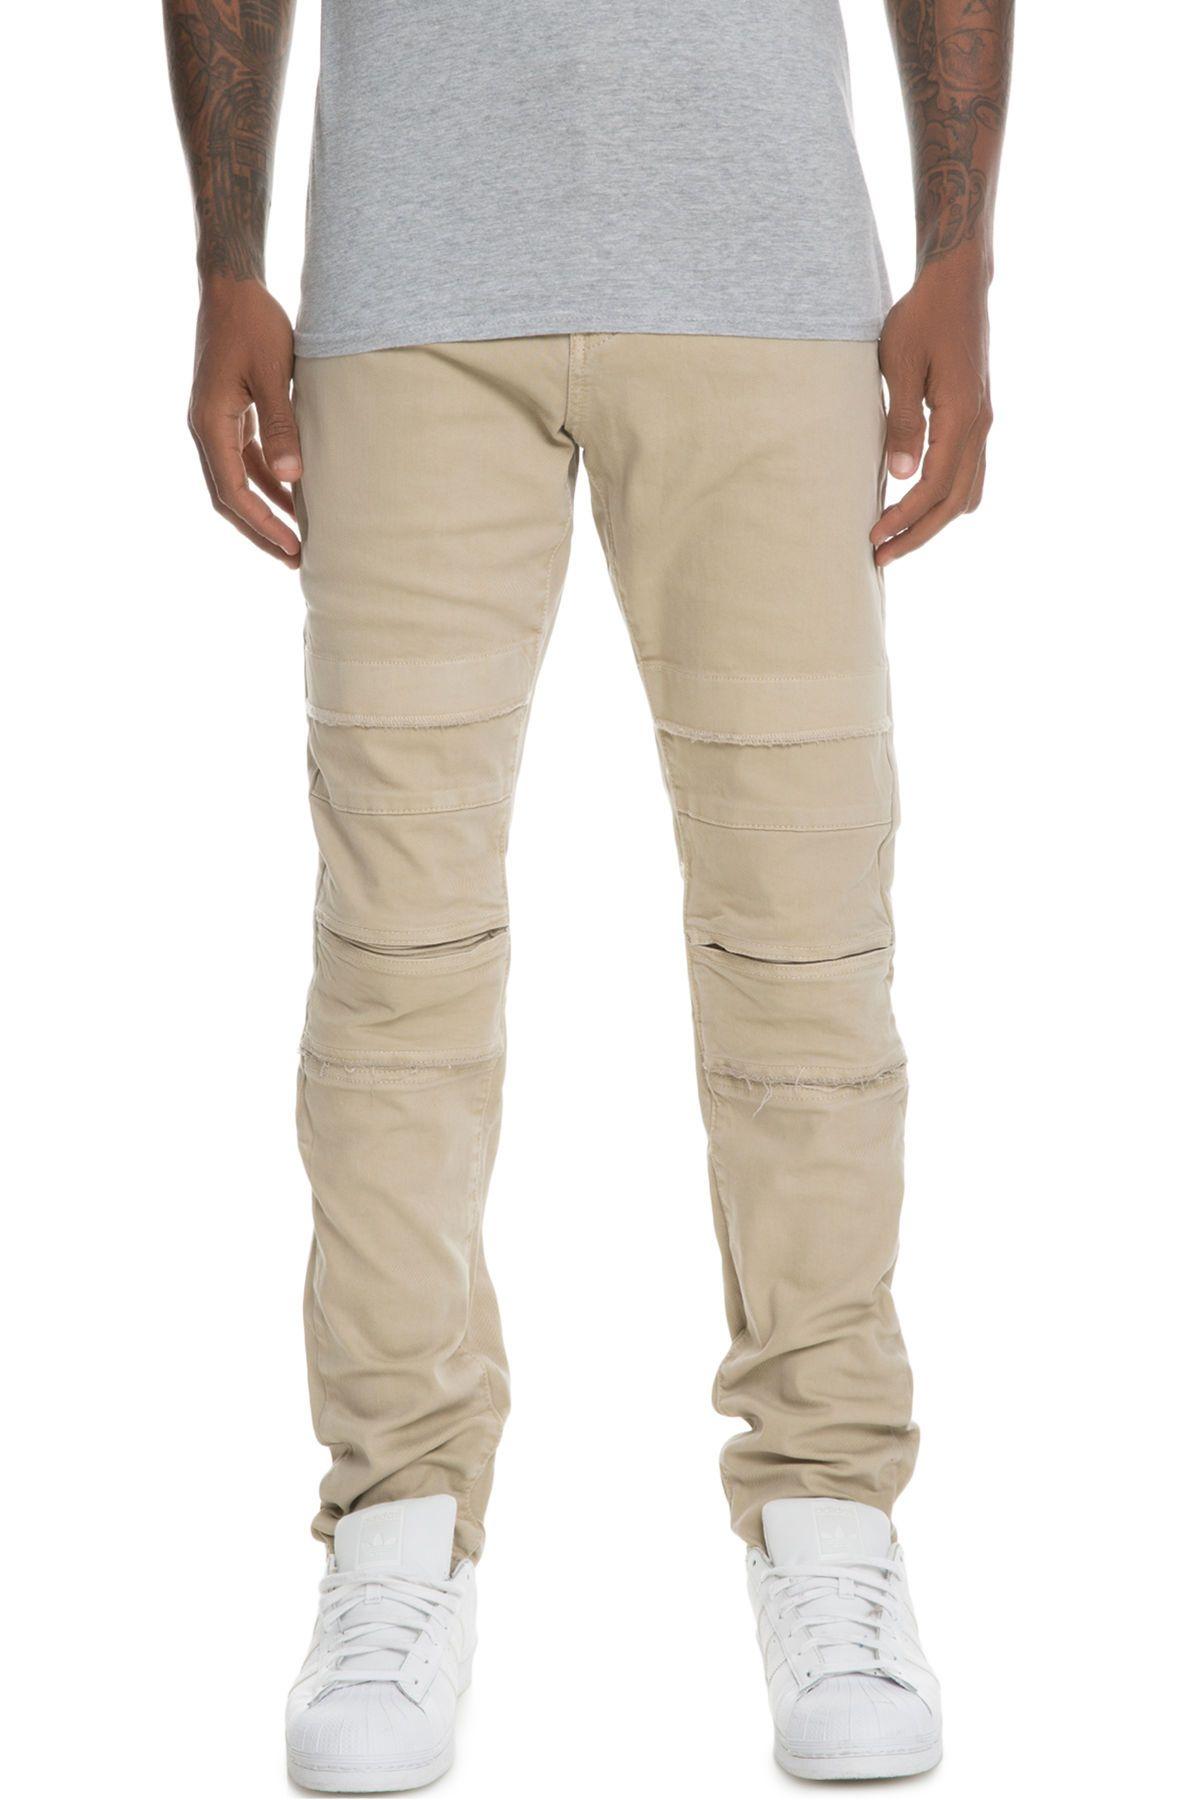 the ali panel stitched denim jeans in khaki